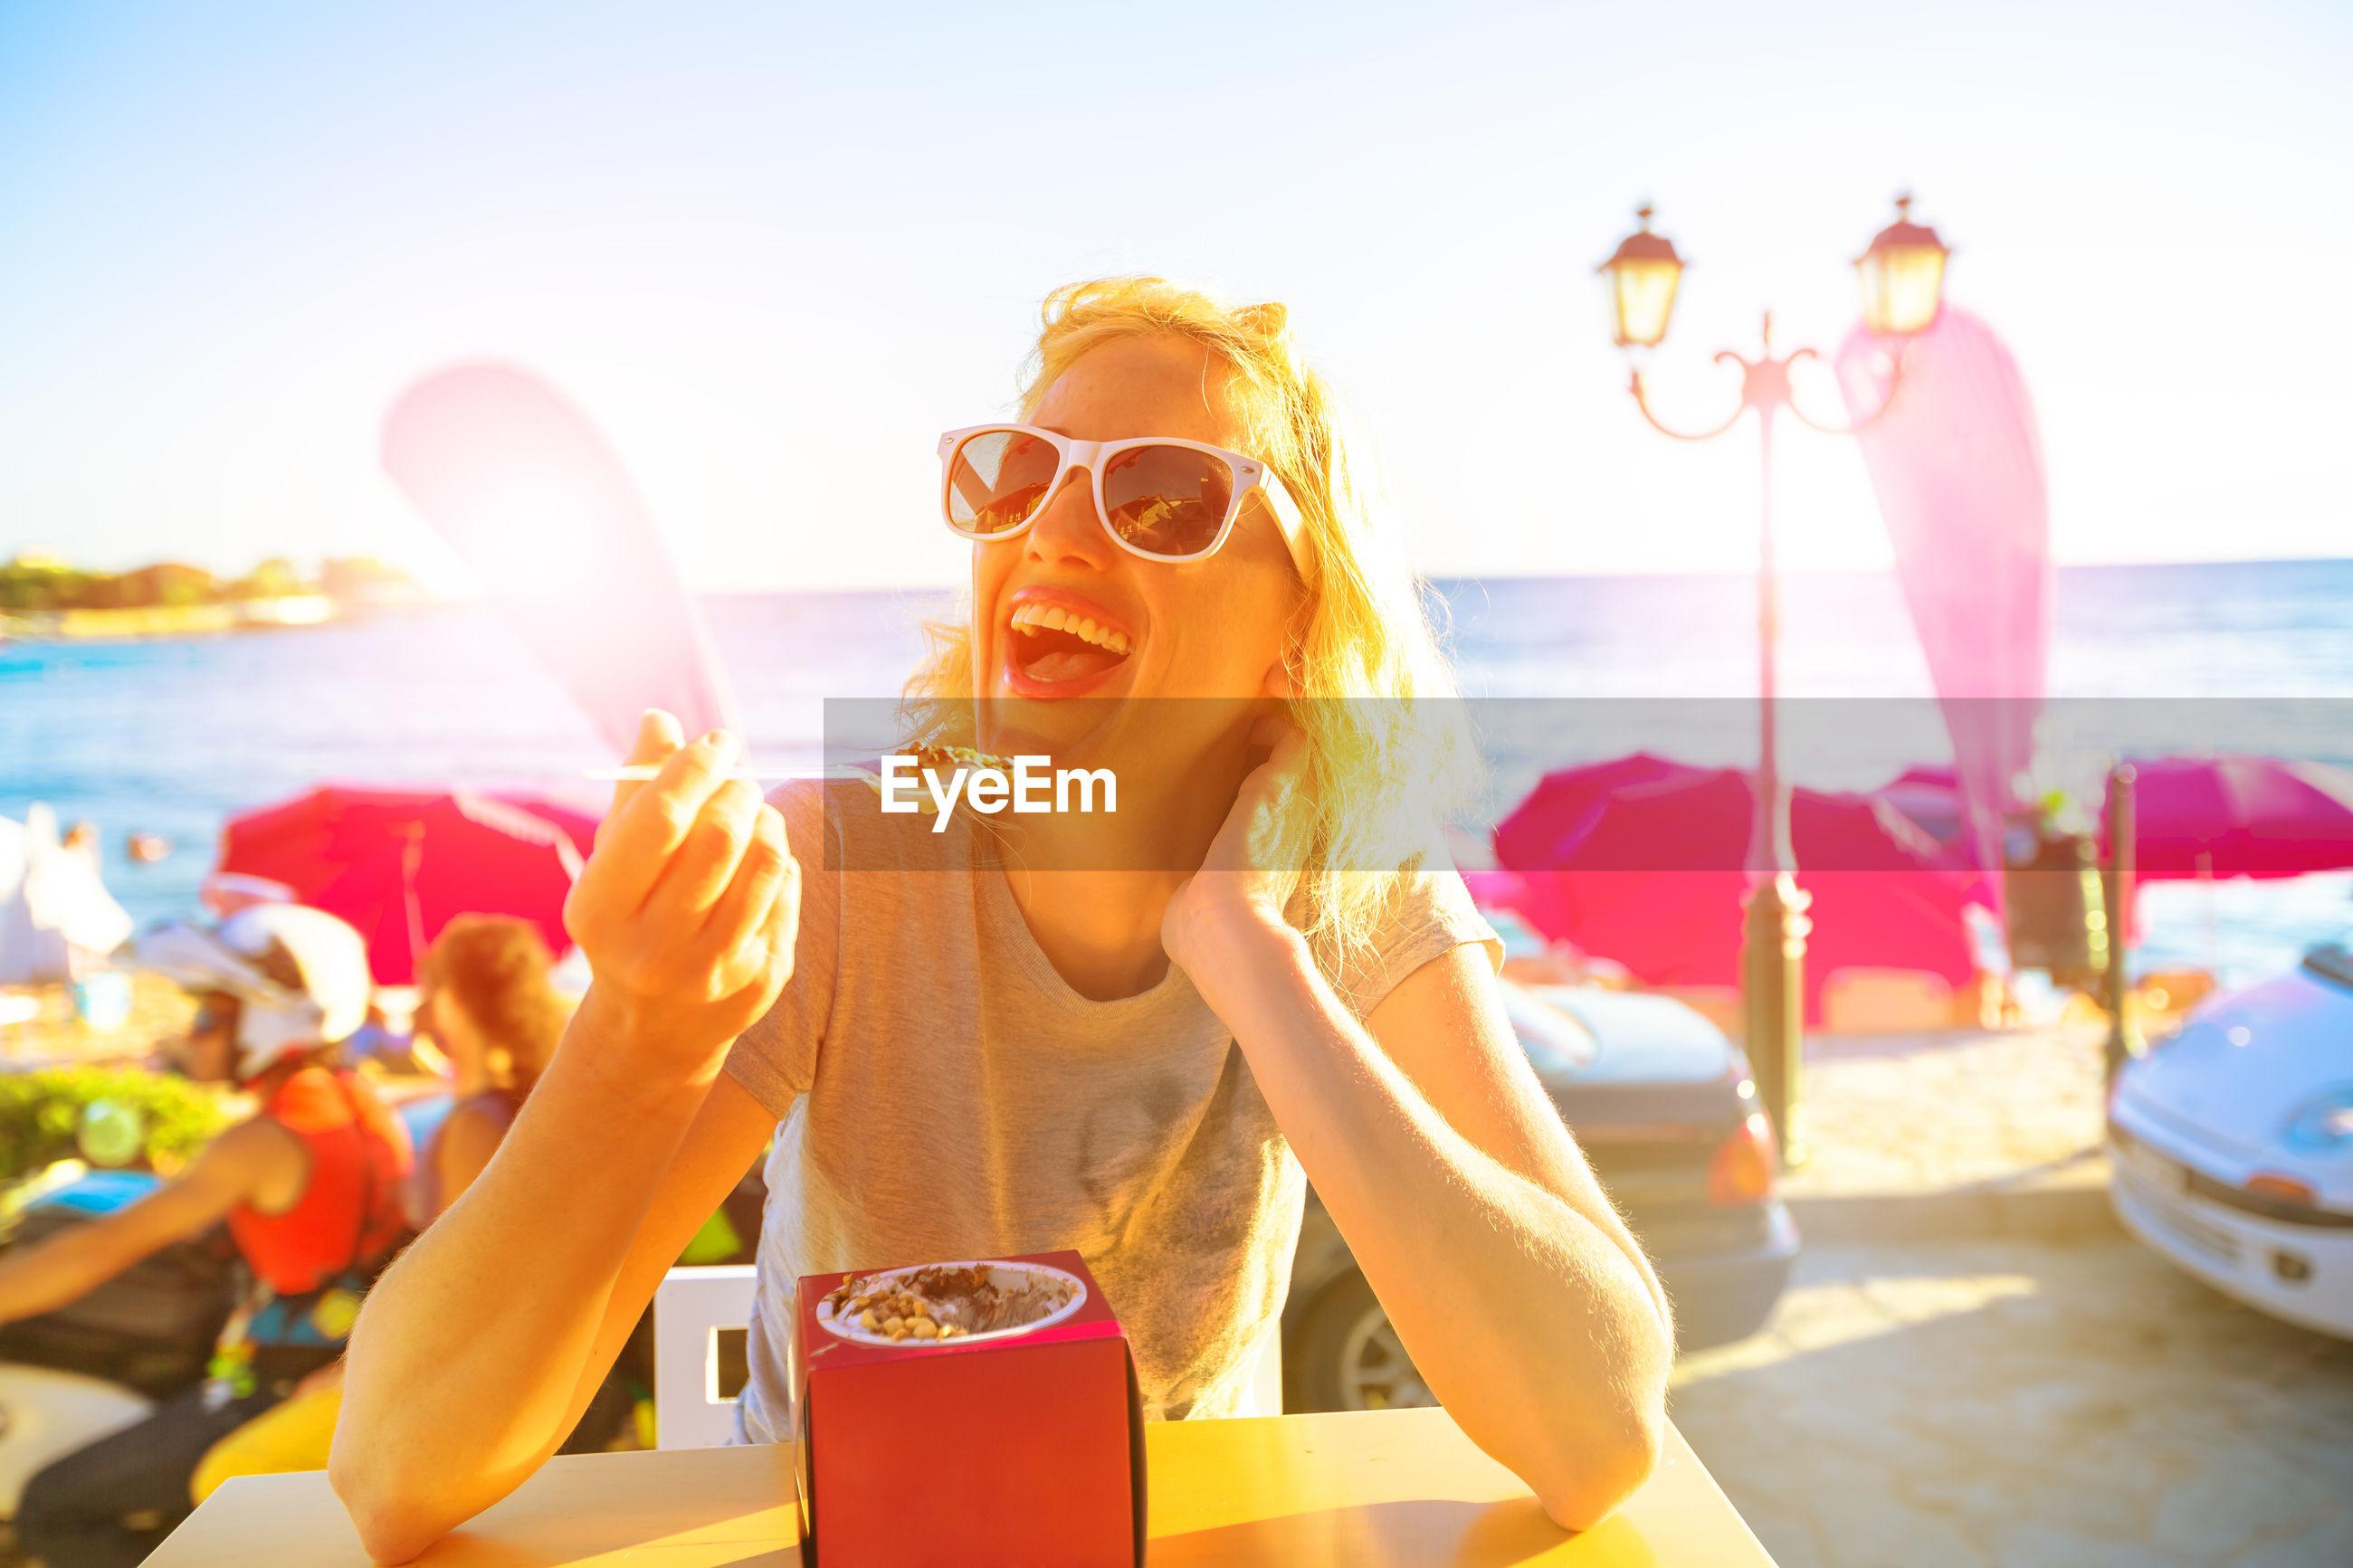 Portrait of cheerful woman having food at beach restaurant against sky